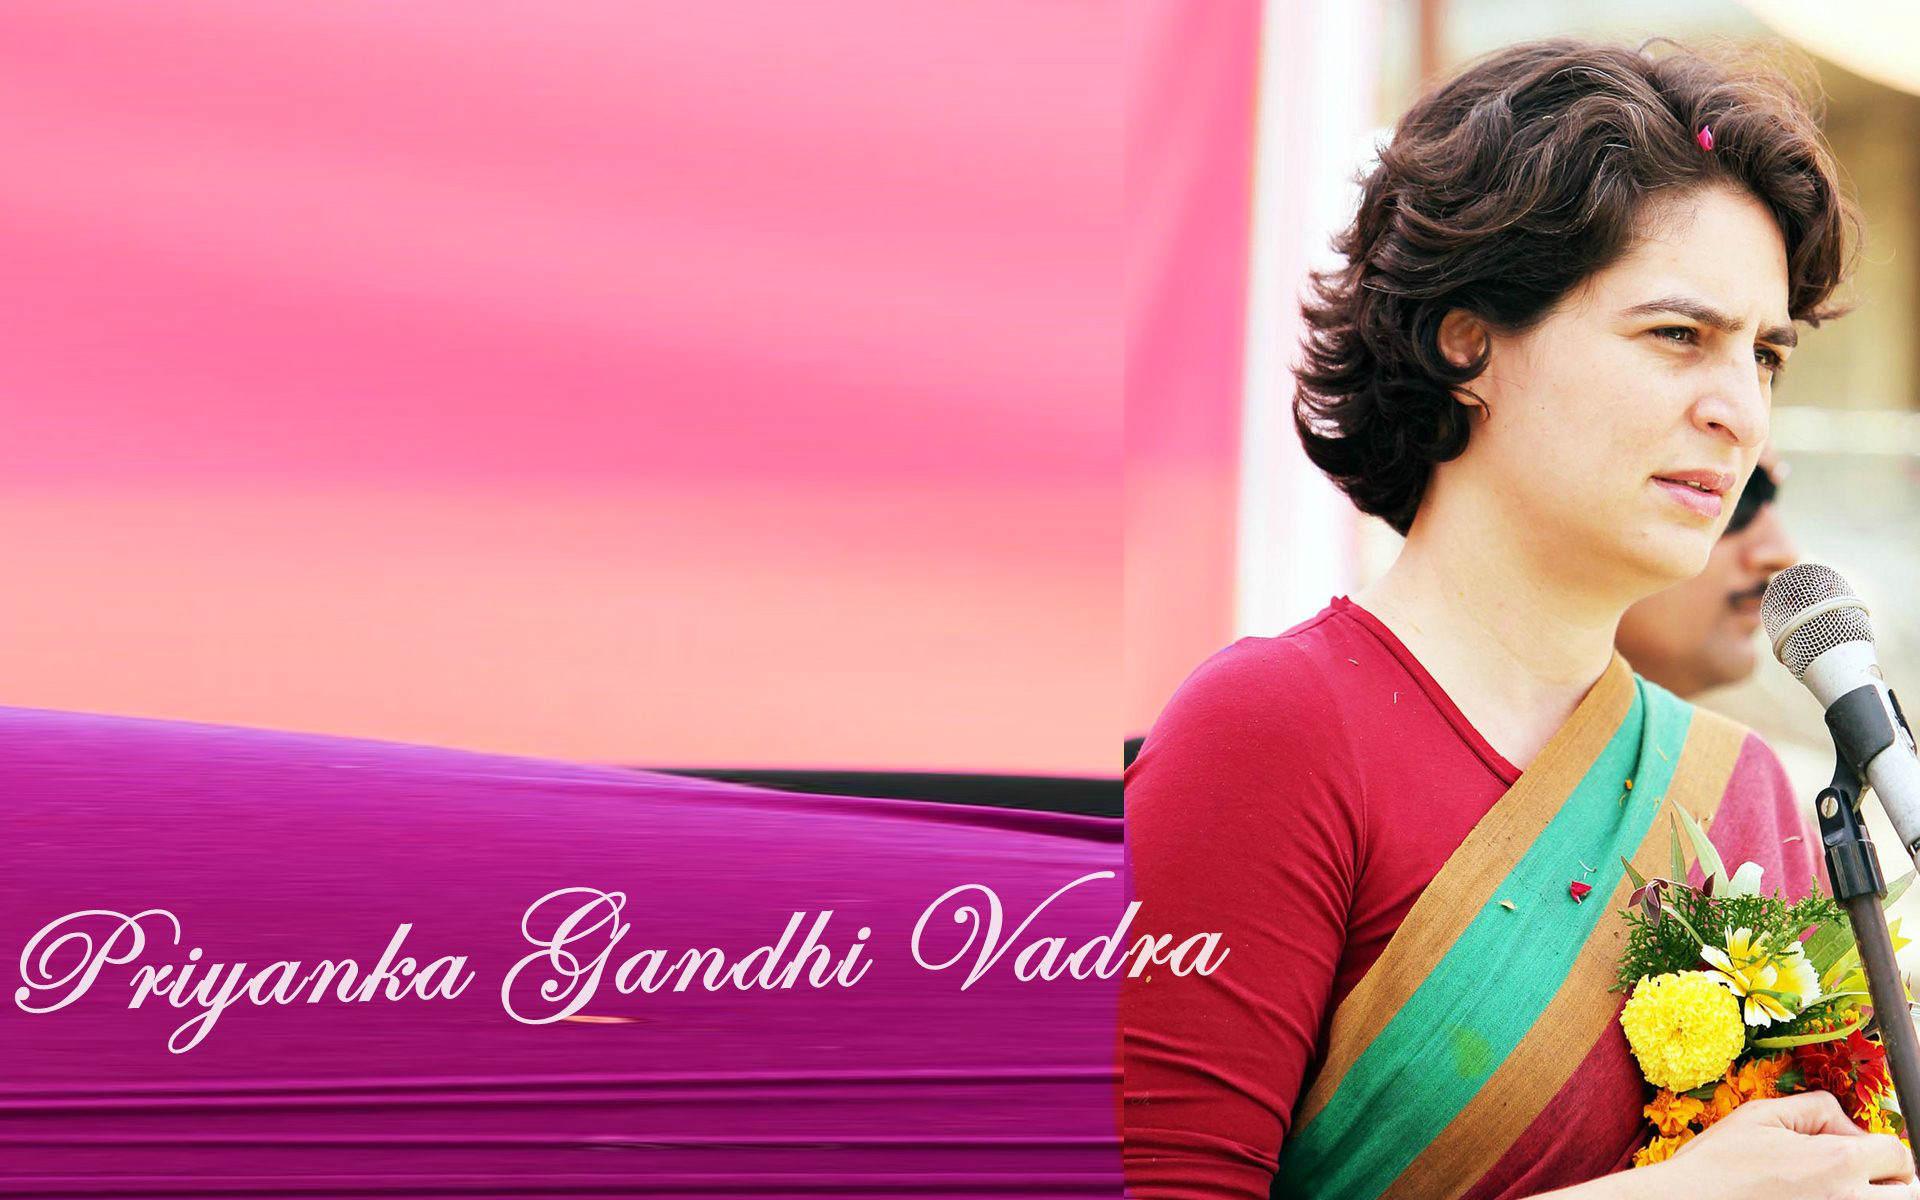 Happy Birthday to Priyanka Gandhi Vadra, hope you join politics in near future!!